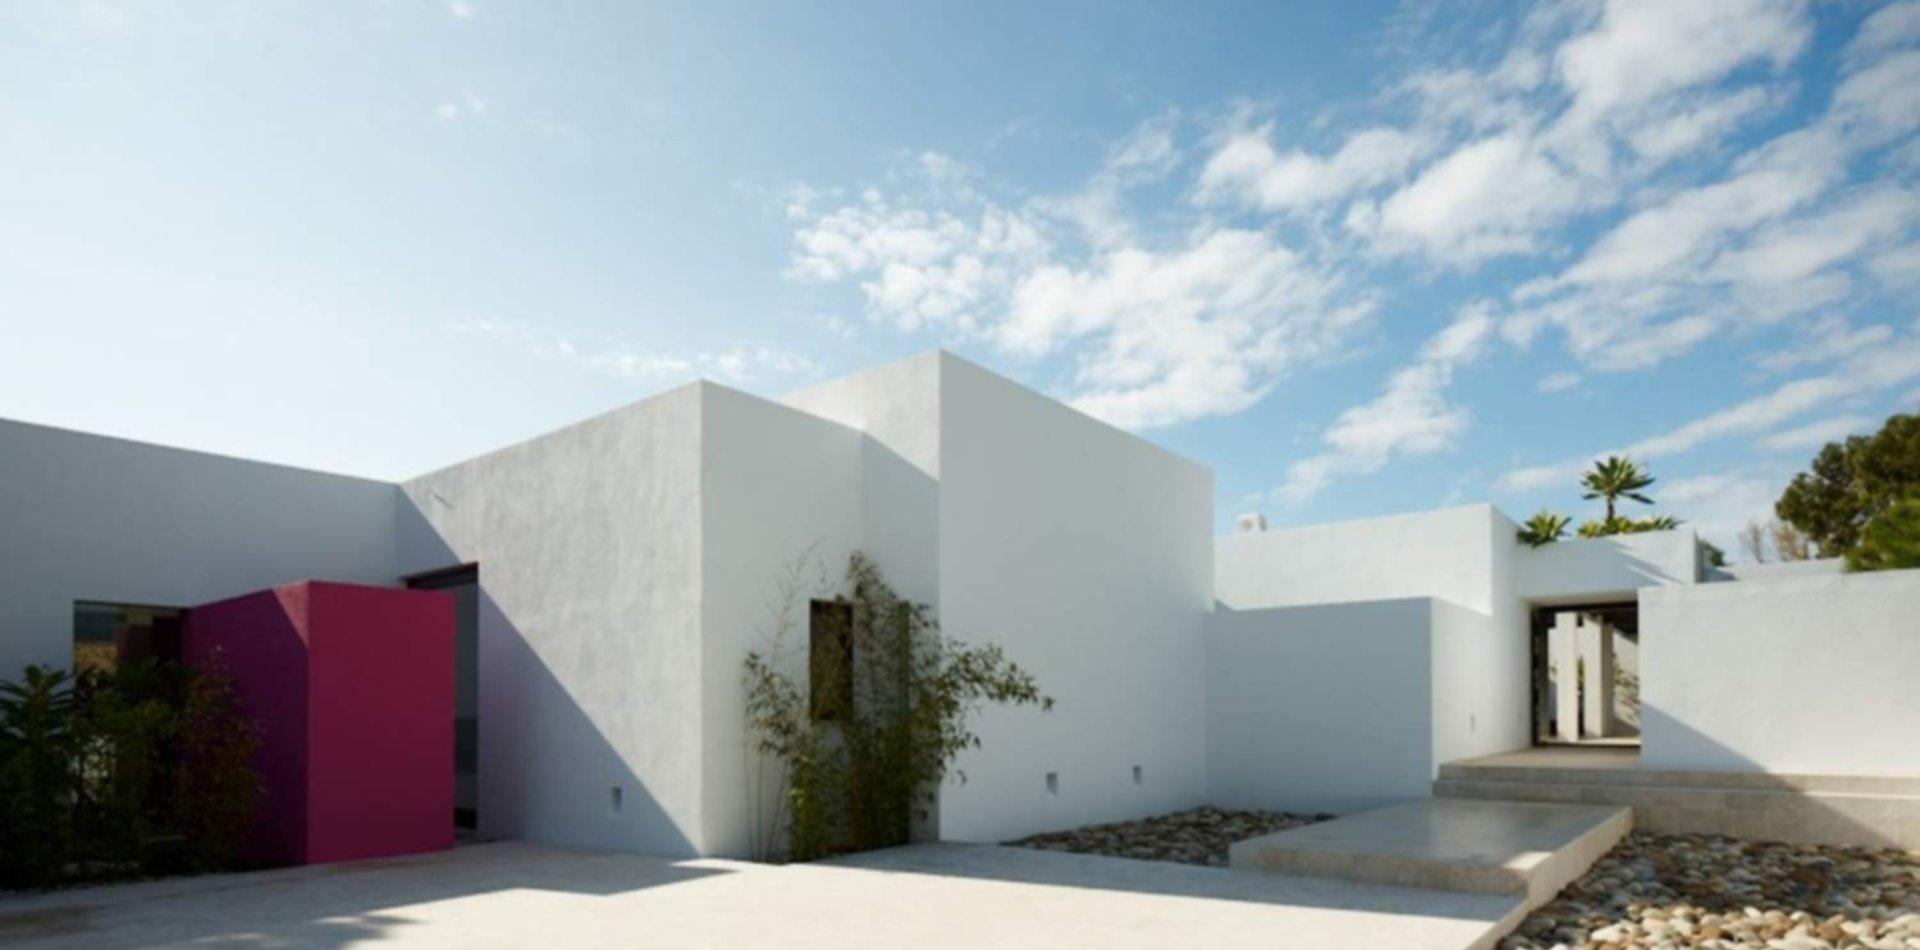 Blanco andaluz